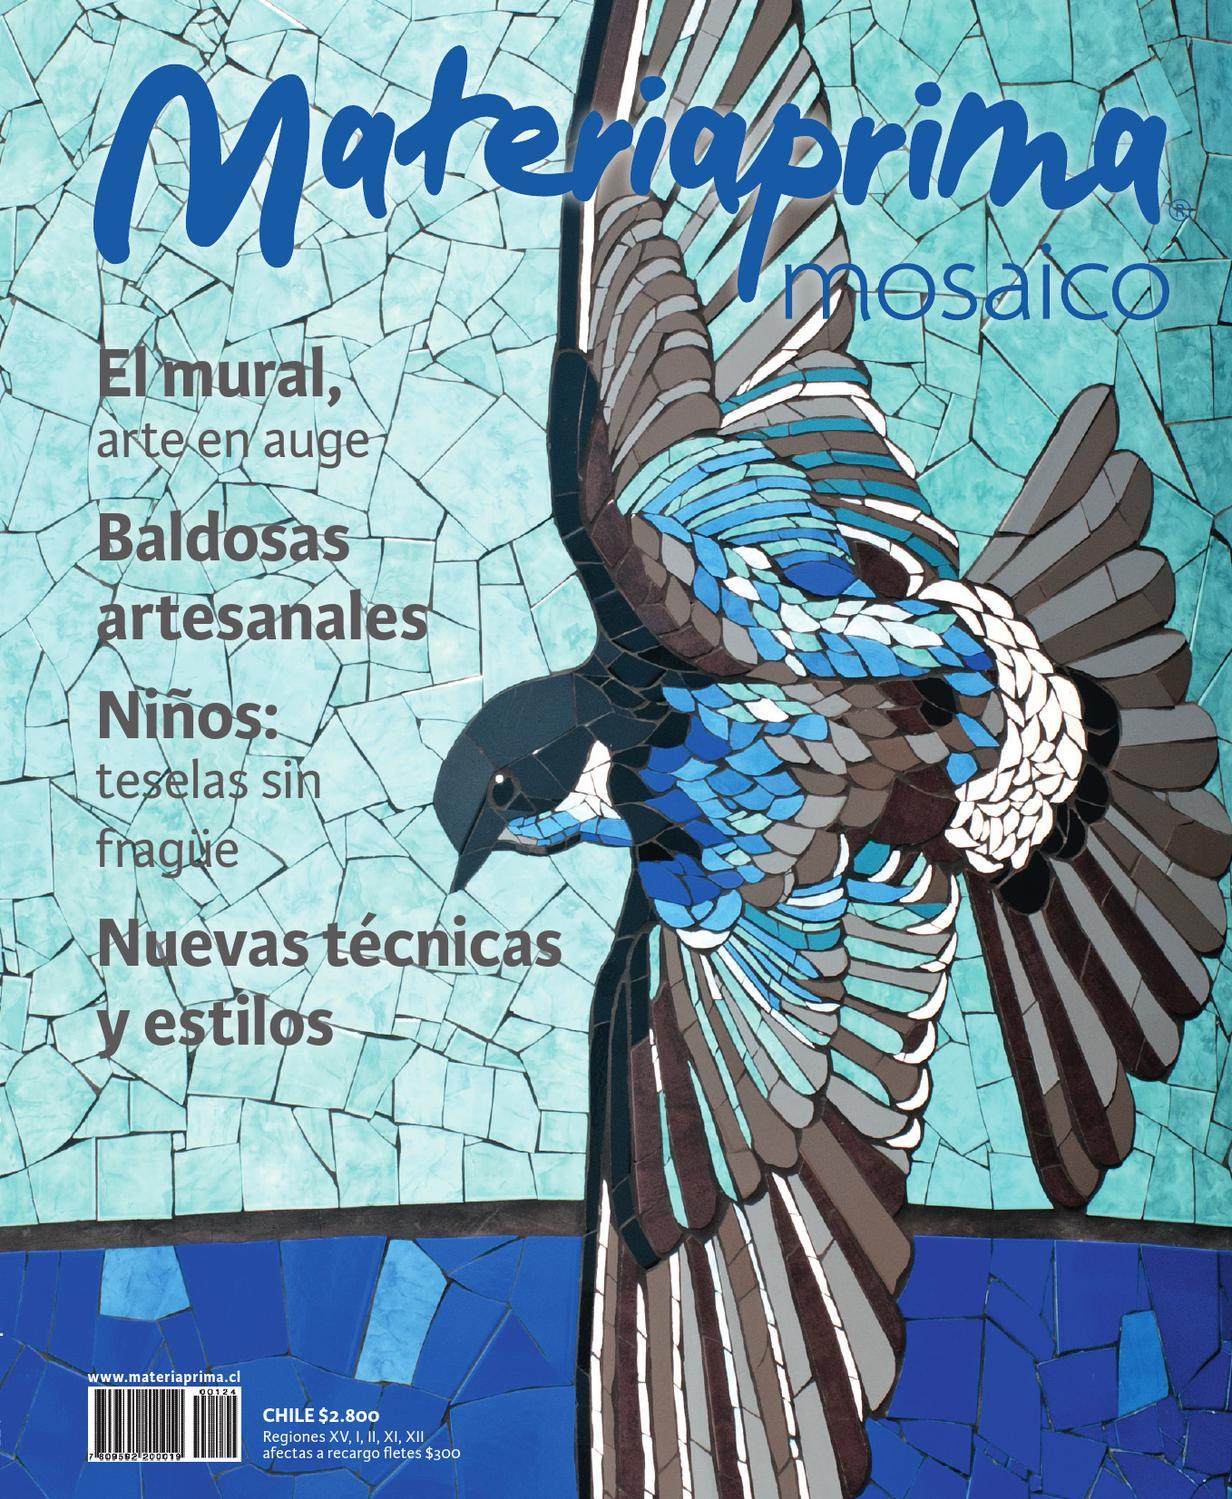 Nº 124 Mayo 2013 - Mosaico by Materia Prima - issuu